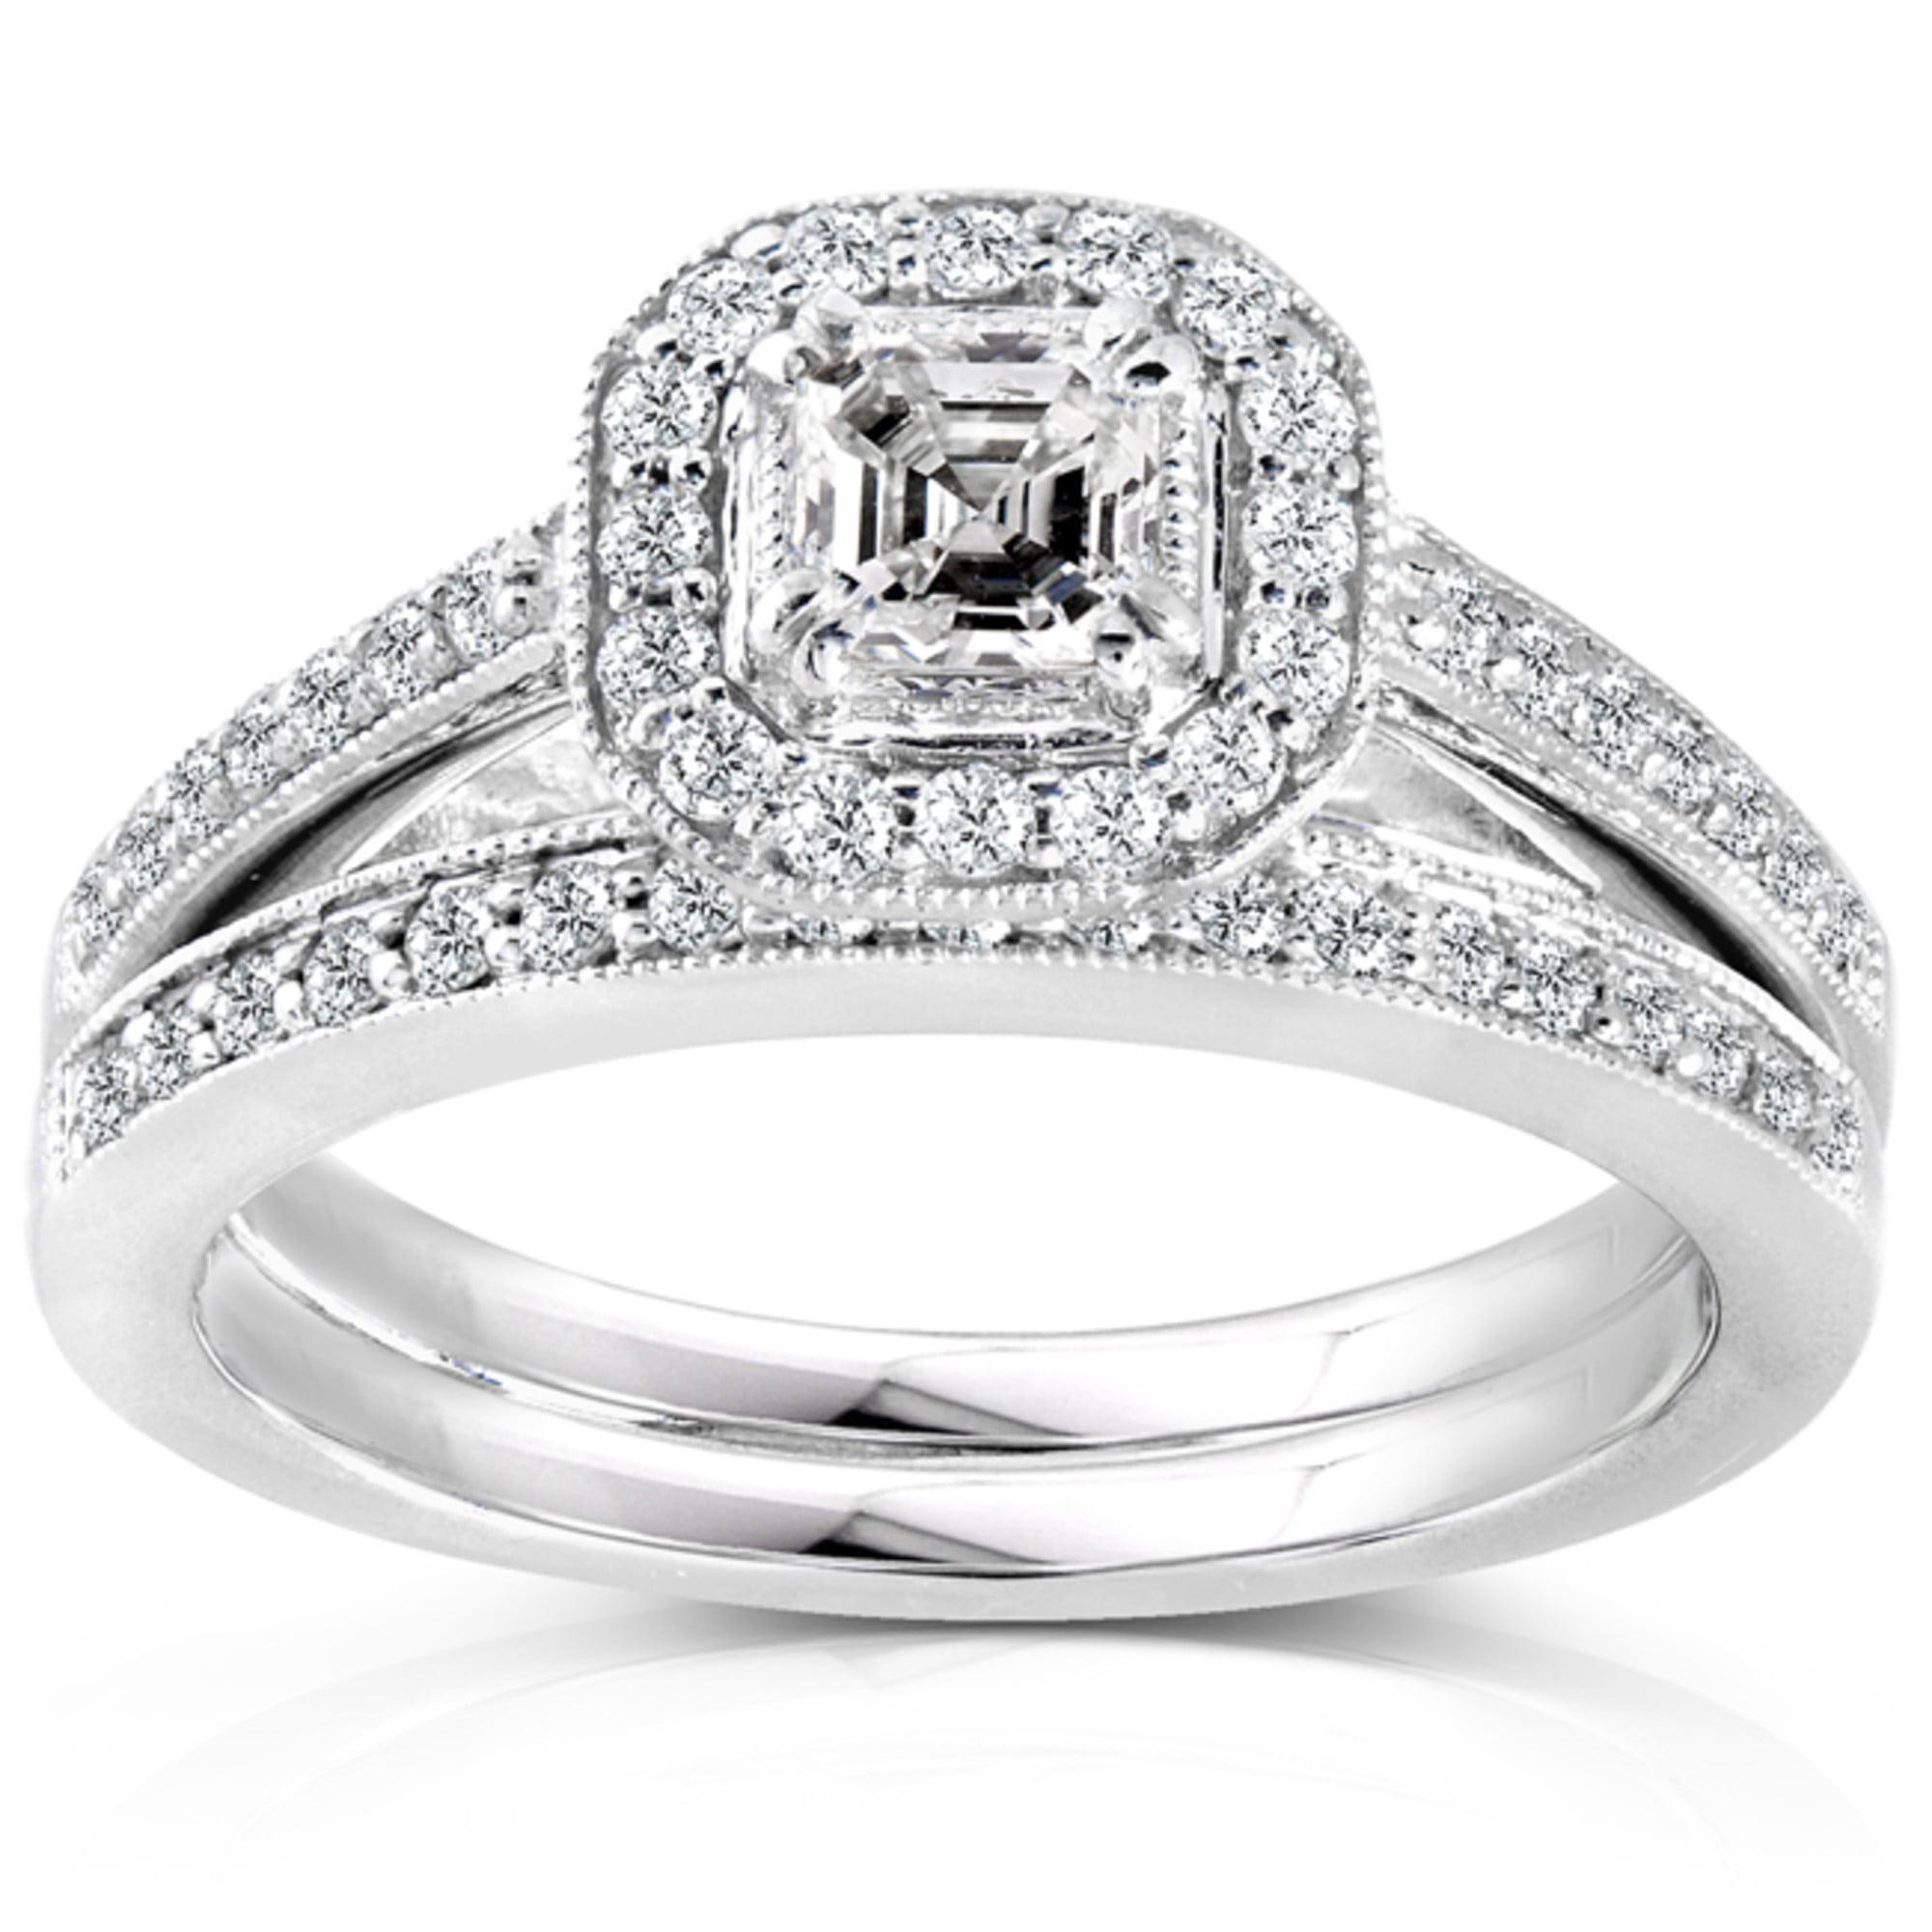 Diamond Wedding Set 5 8 Carat (ctw) in 14K White Gold by